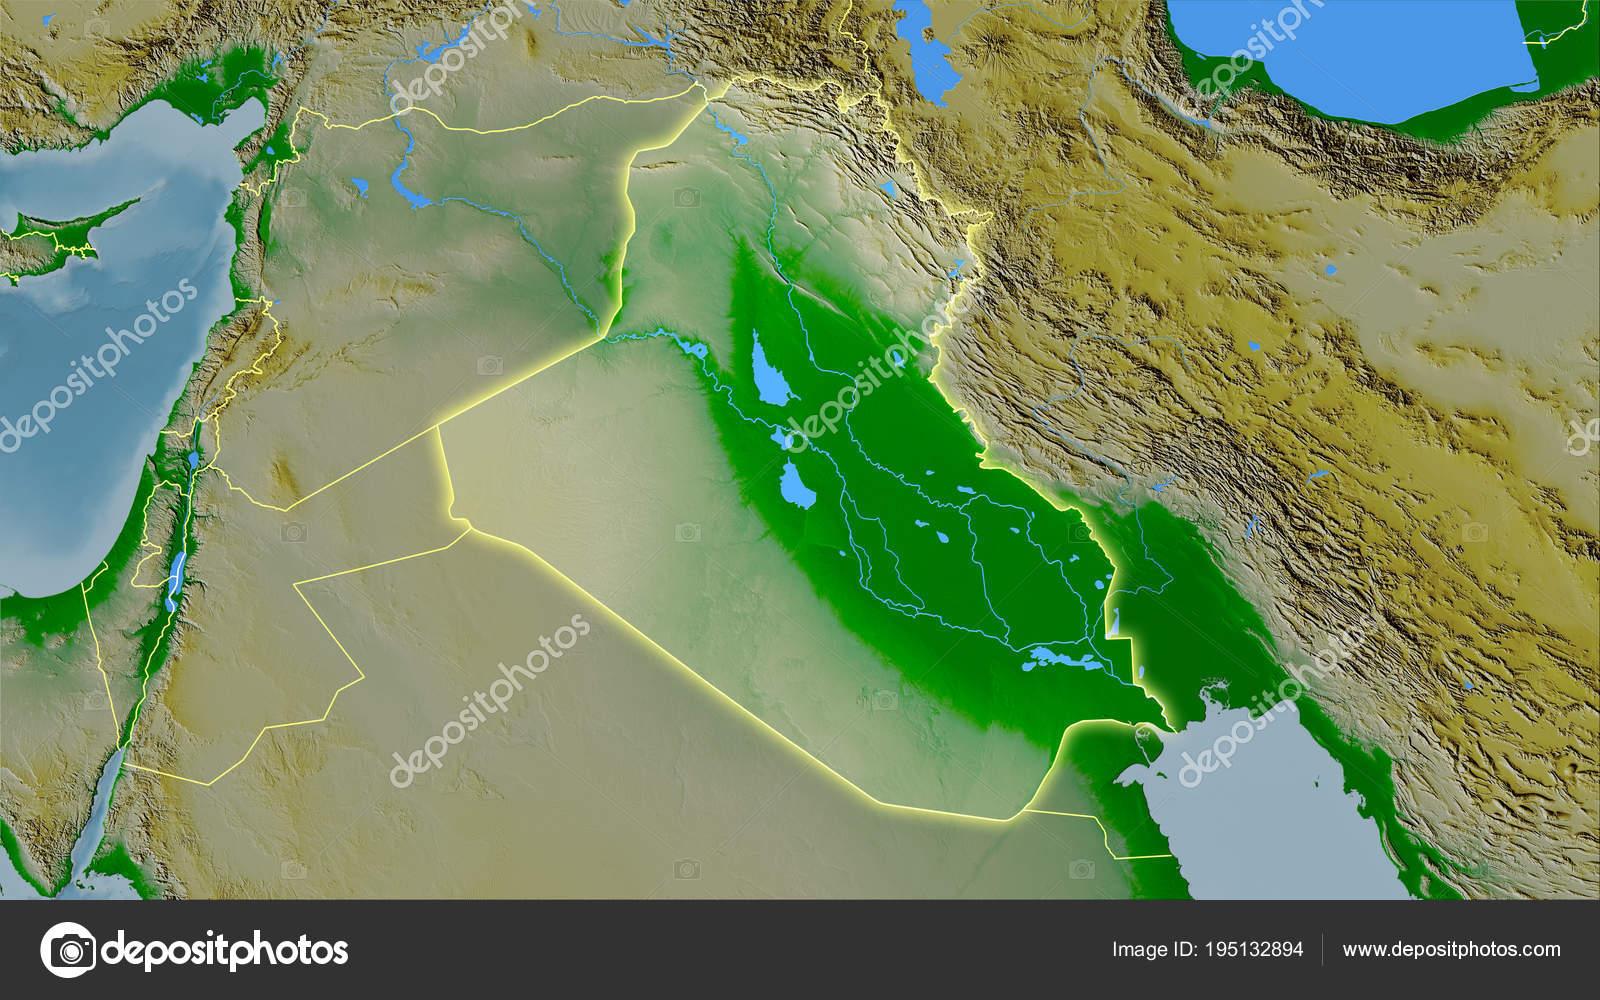 Iraq Topographic Physical Light Glow Stock Photo C Yarr65